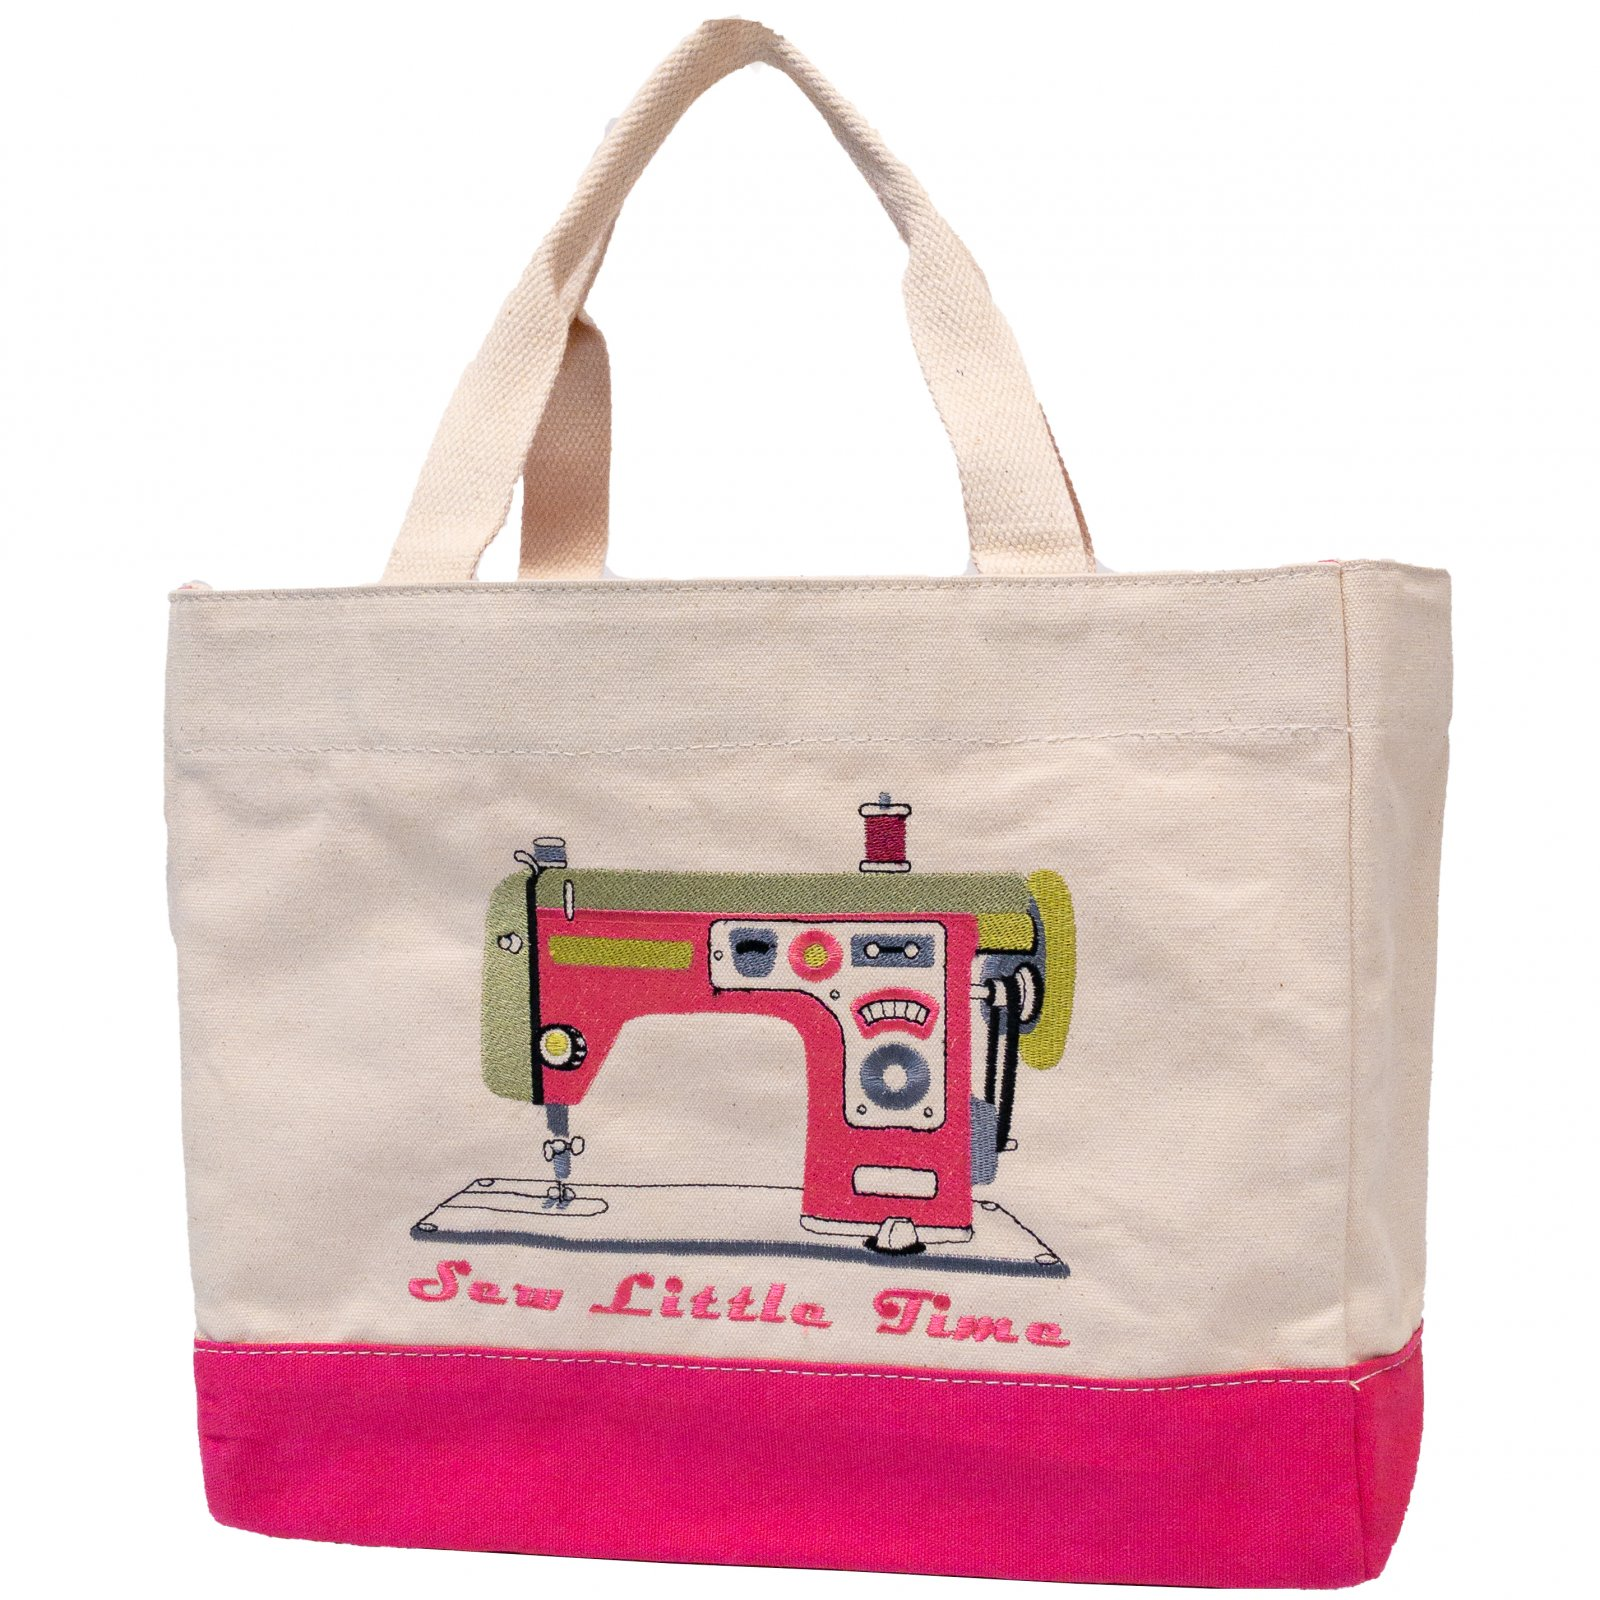 Embroidered Canvas Tote Retro Machine Pink